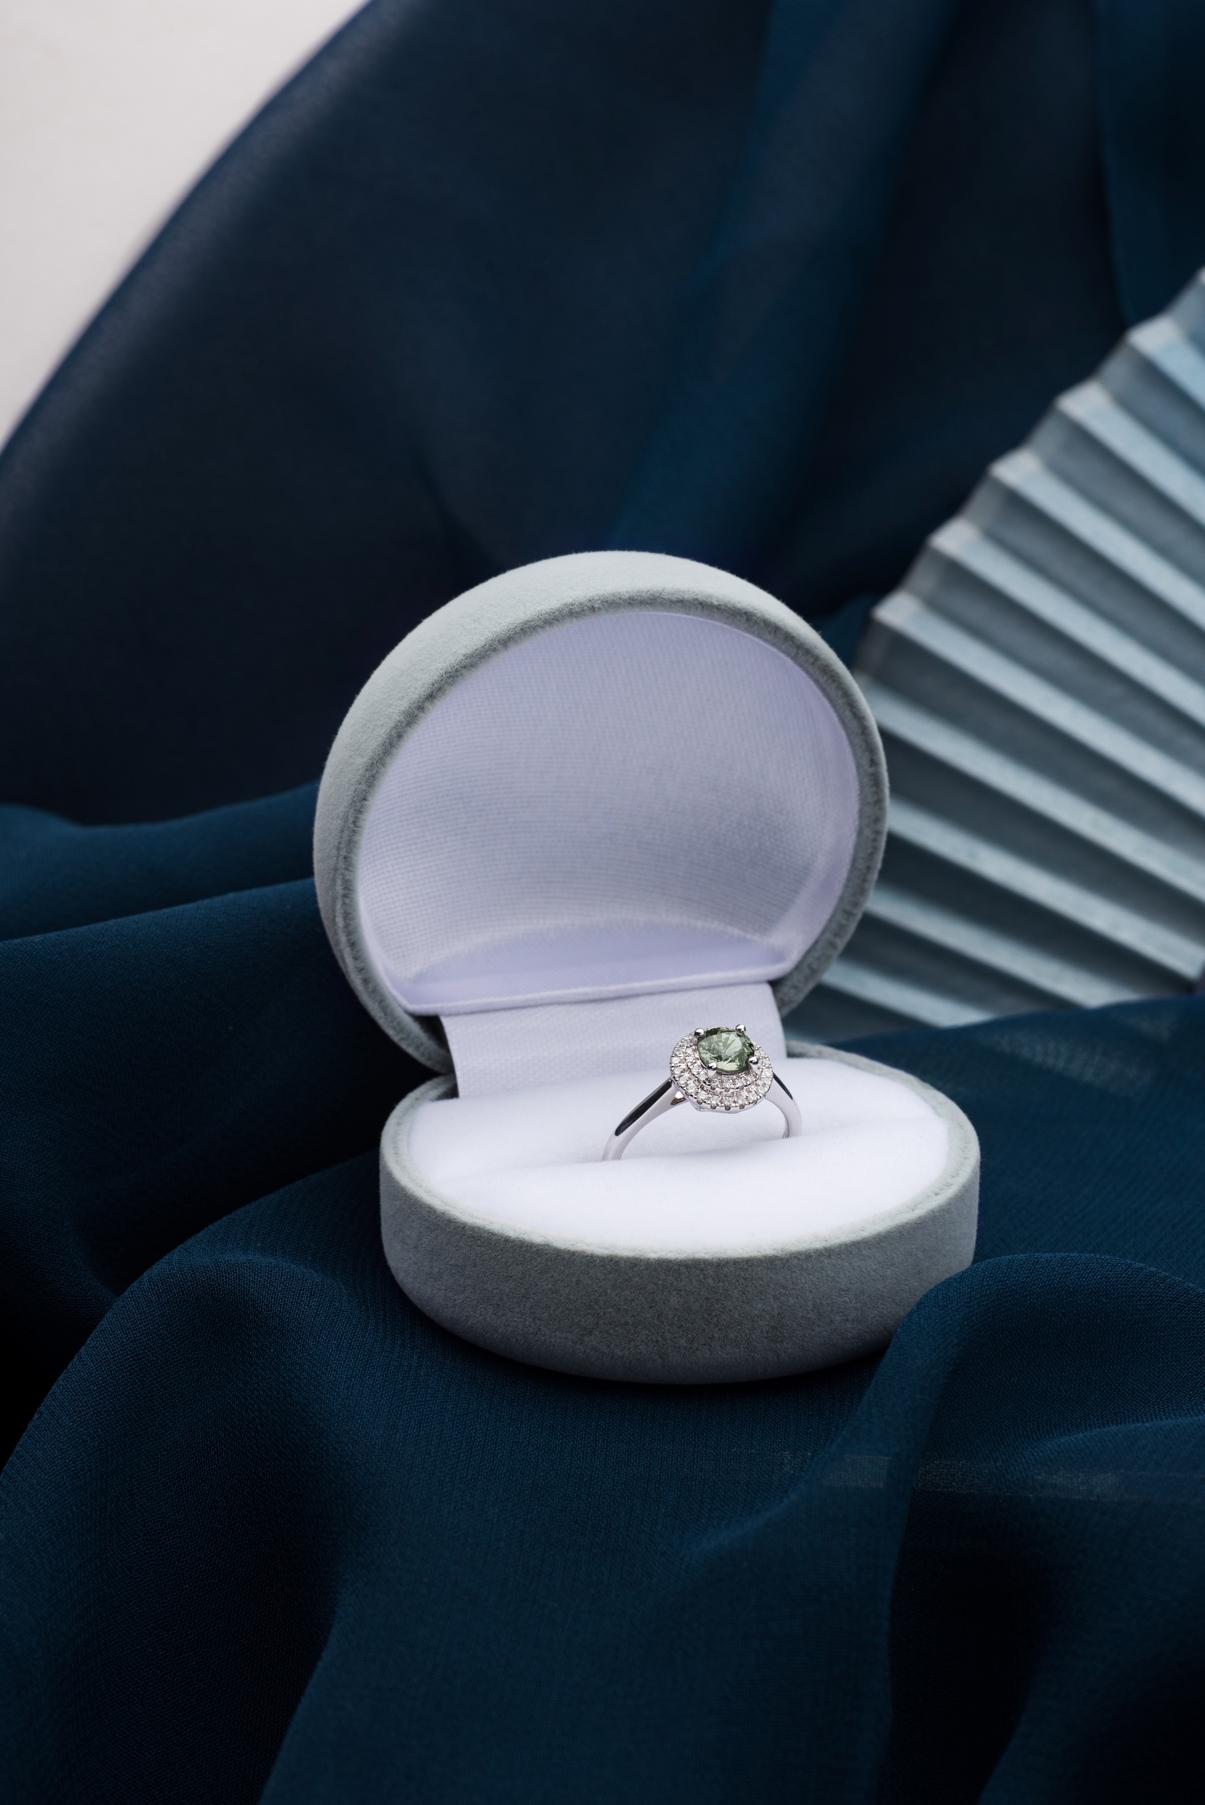 180921_Engagement-Ring_Sapphire_Flat-Lay-1671.jpg